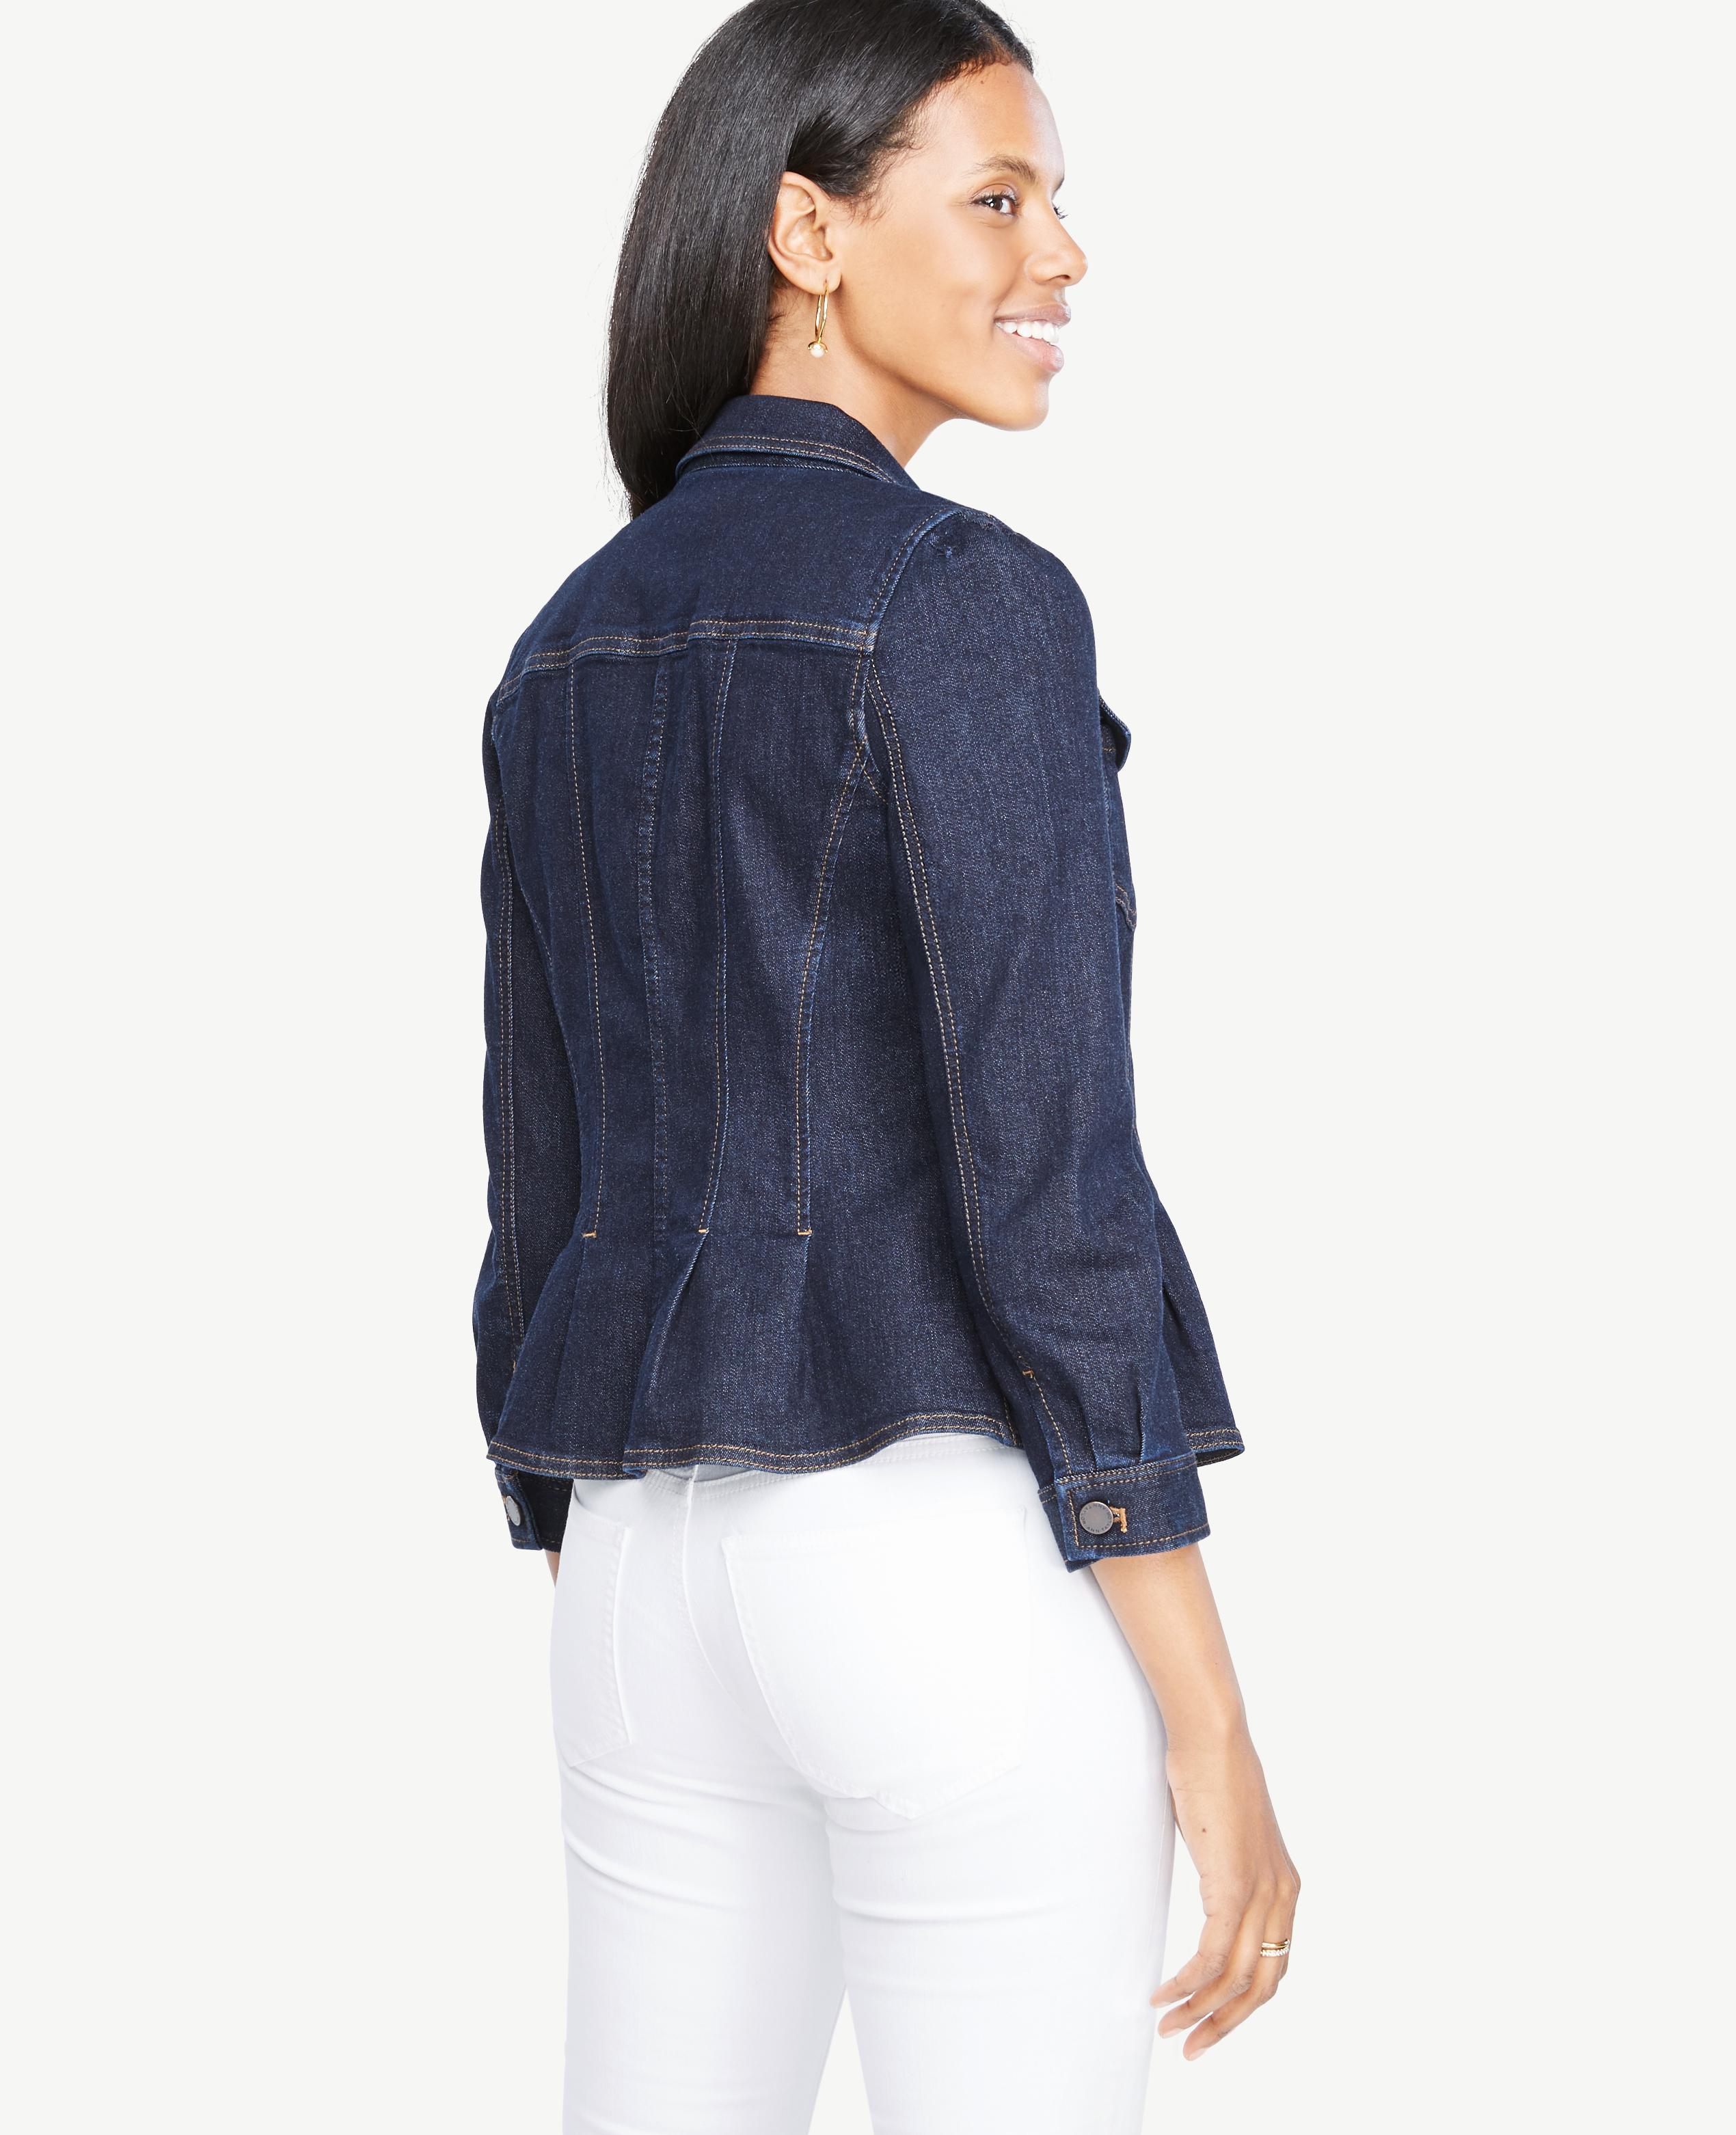 5fa6c451bdc Lyst - Ann Taylor Petite Denim Peplum Jacket in Blue